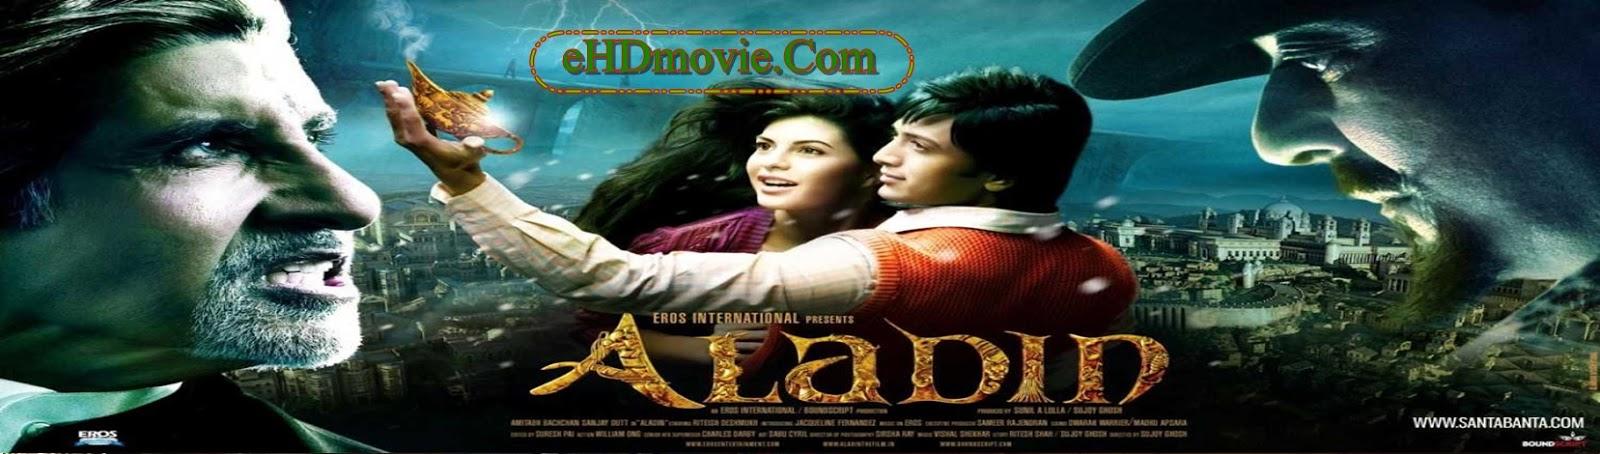 Aladin 2009 Full Movie Hindi 720p ORG BRRip 550MB HEVC ESubs Free Download